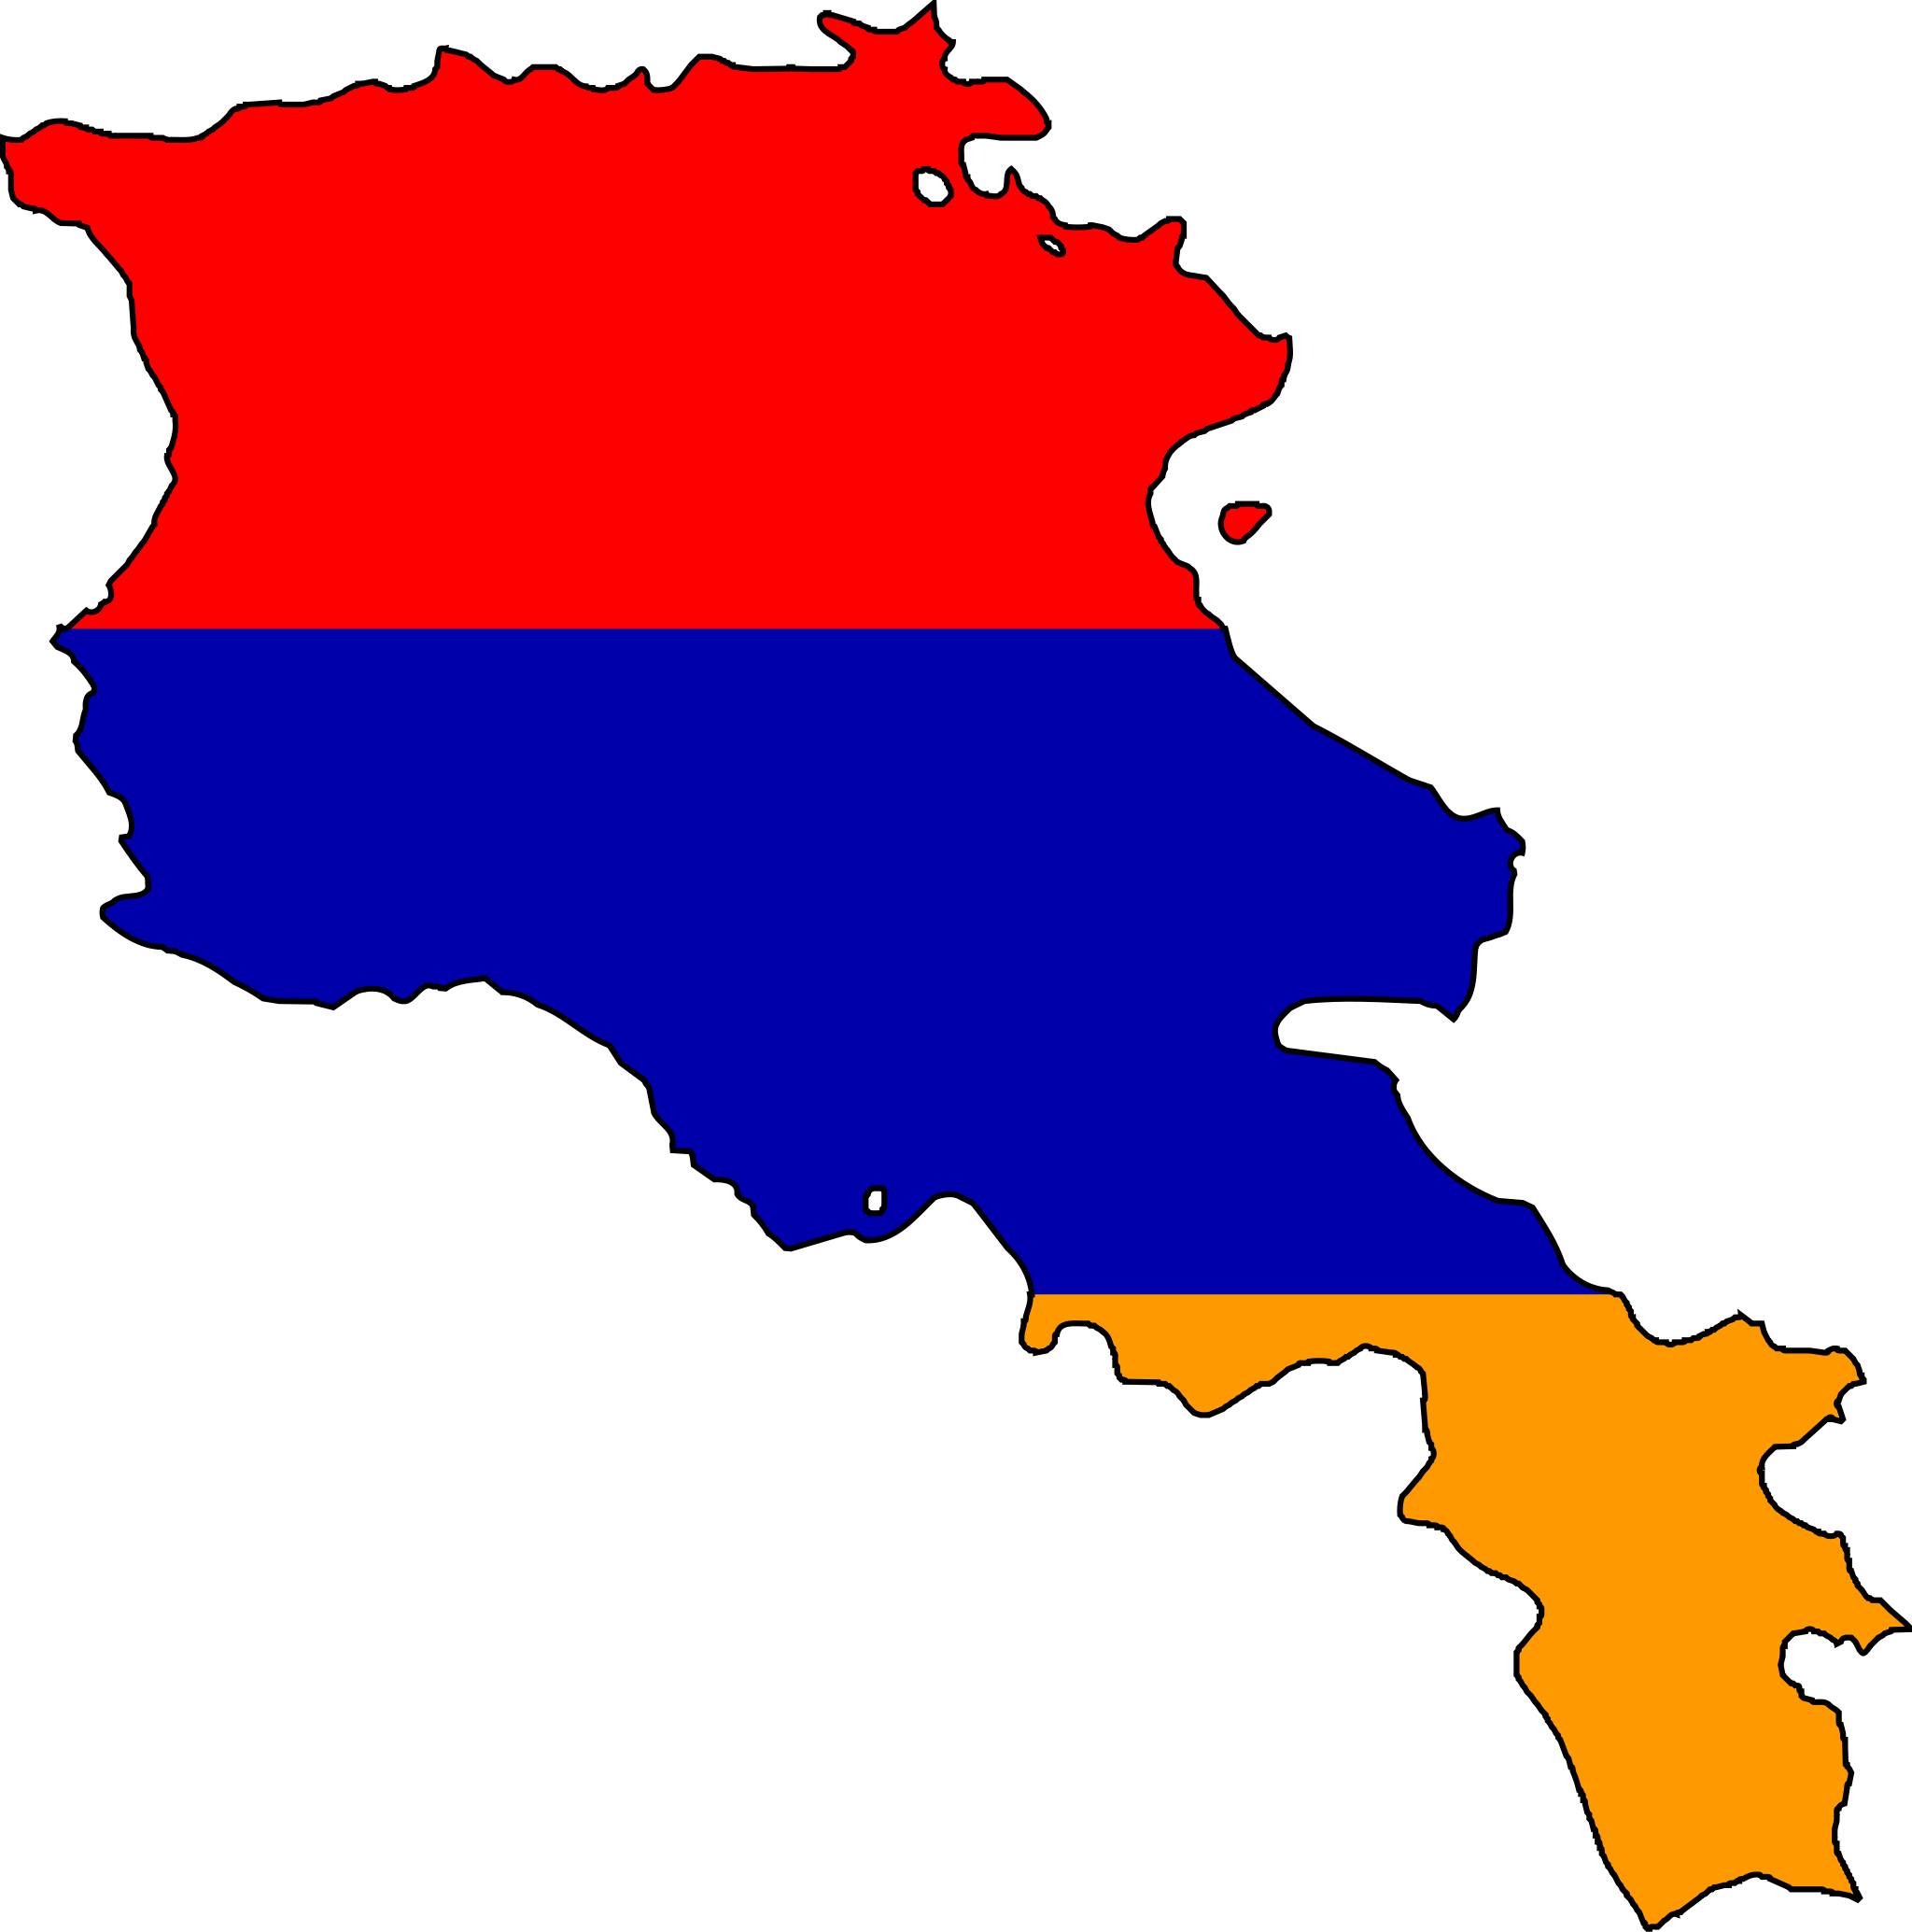 Armenia flag free images. Clipart map public domain